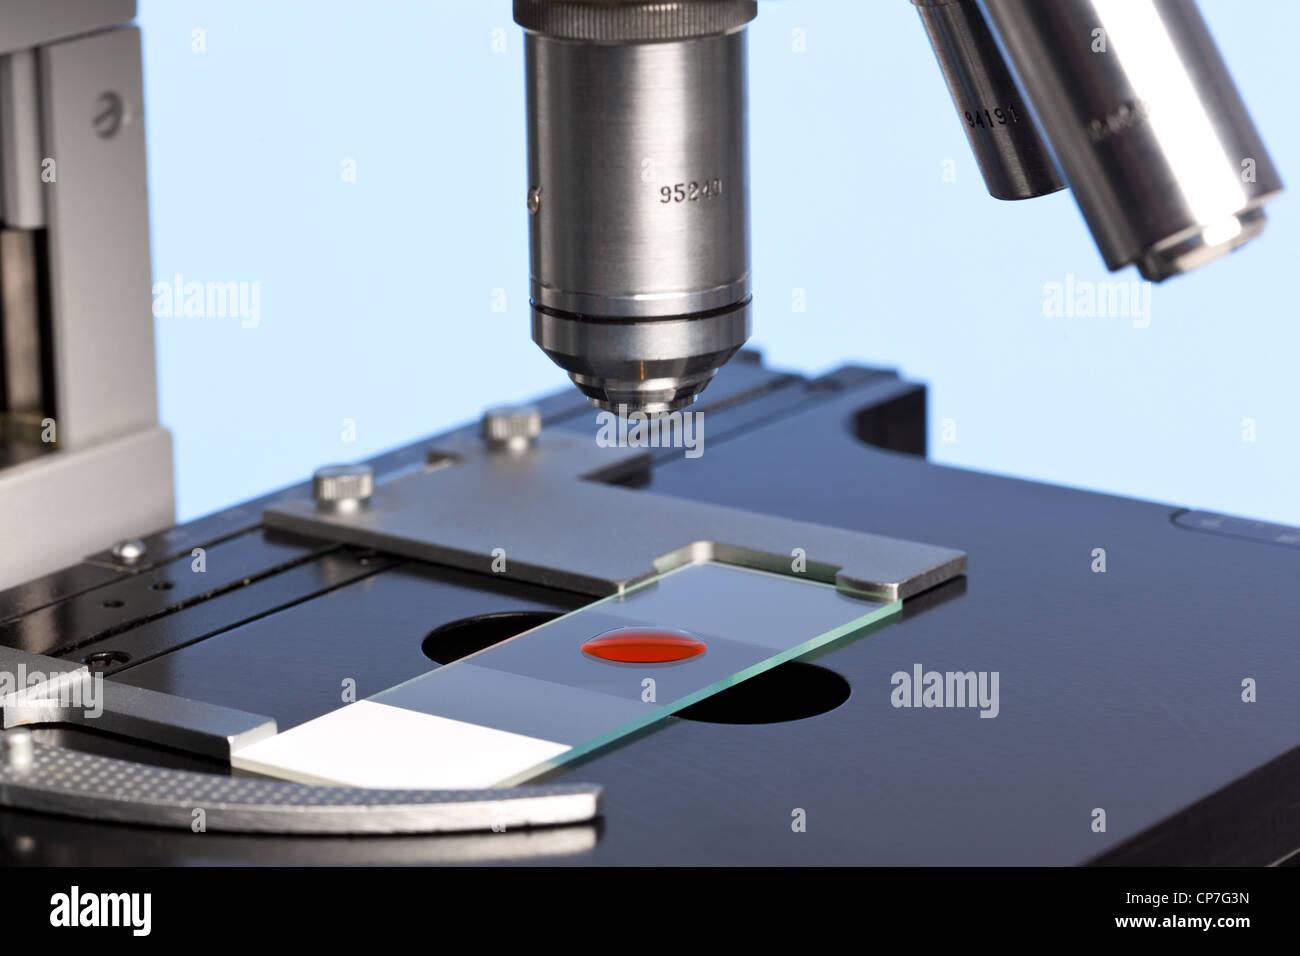 Mikroskop foto stockfotos mikroskop foto bilder alamy